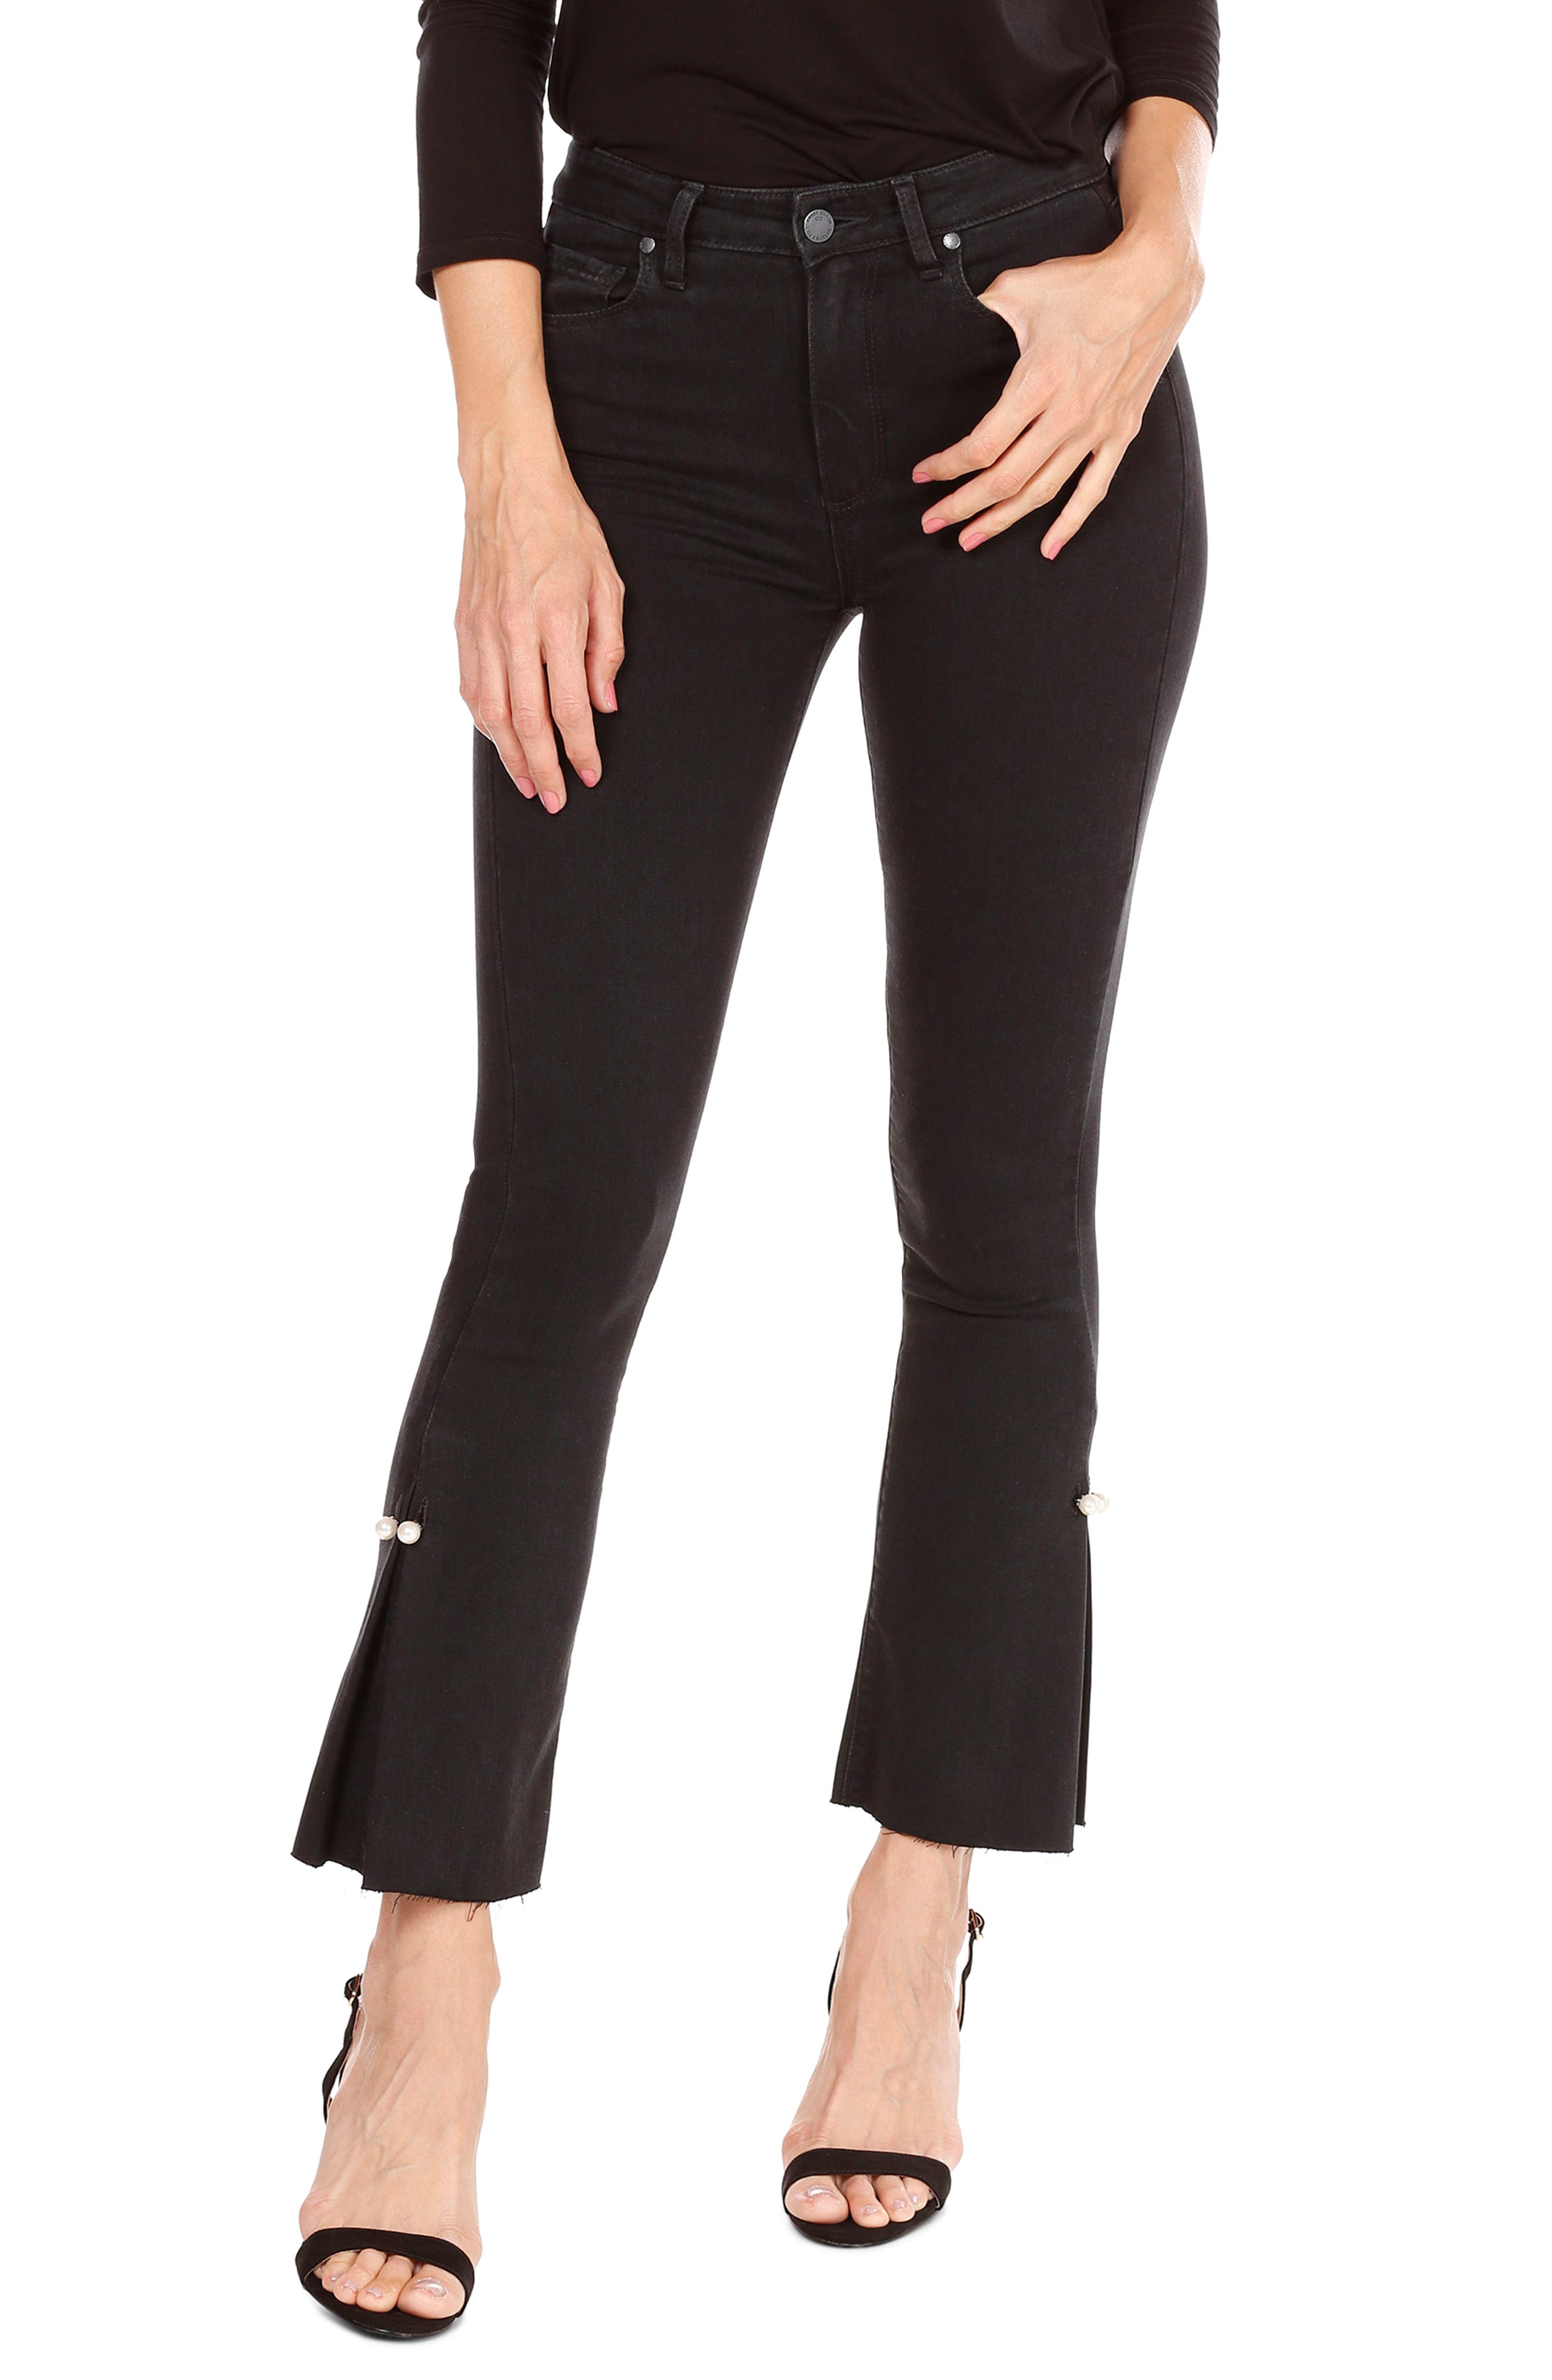 Alternate Image 1 Selected - PAIGE Transcend - Colette High Waist Crop Flare Jeans (Bandit)